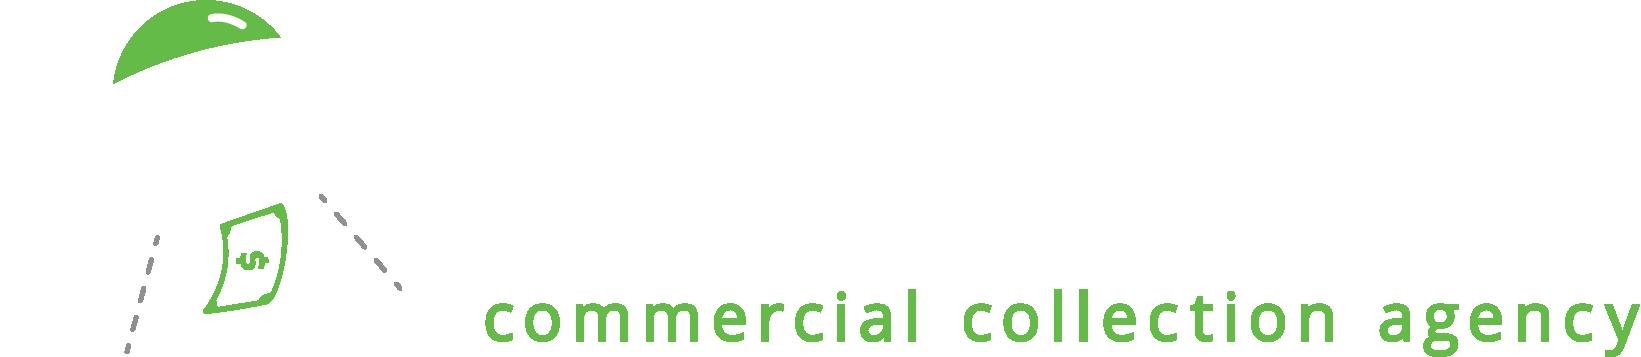 enterprise-recovery_logo_header-2.png